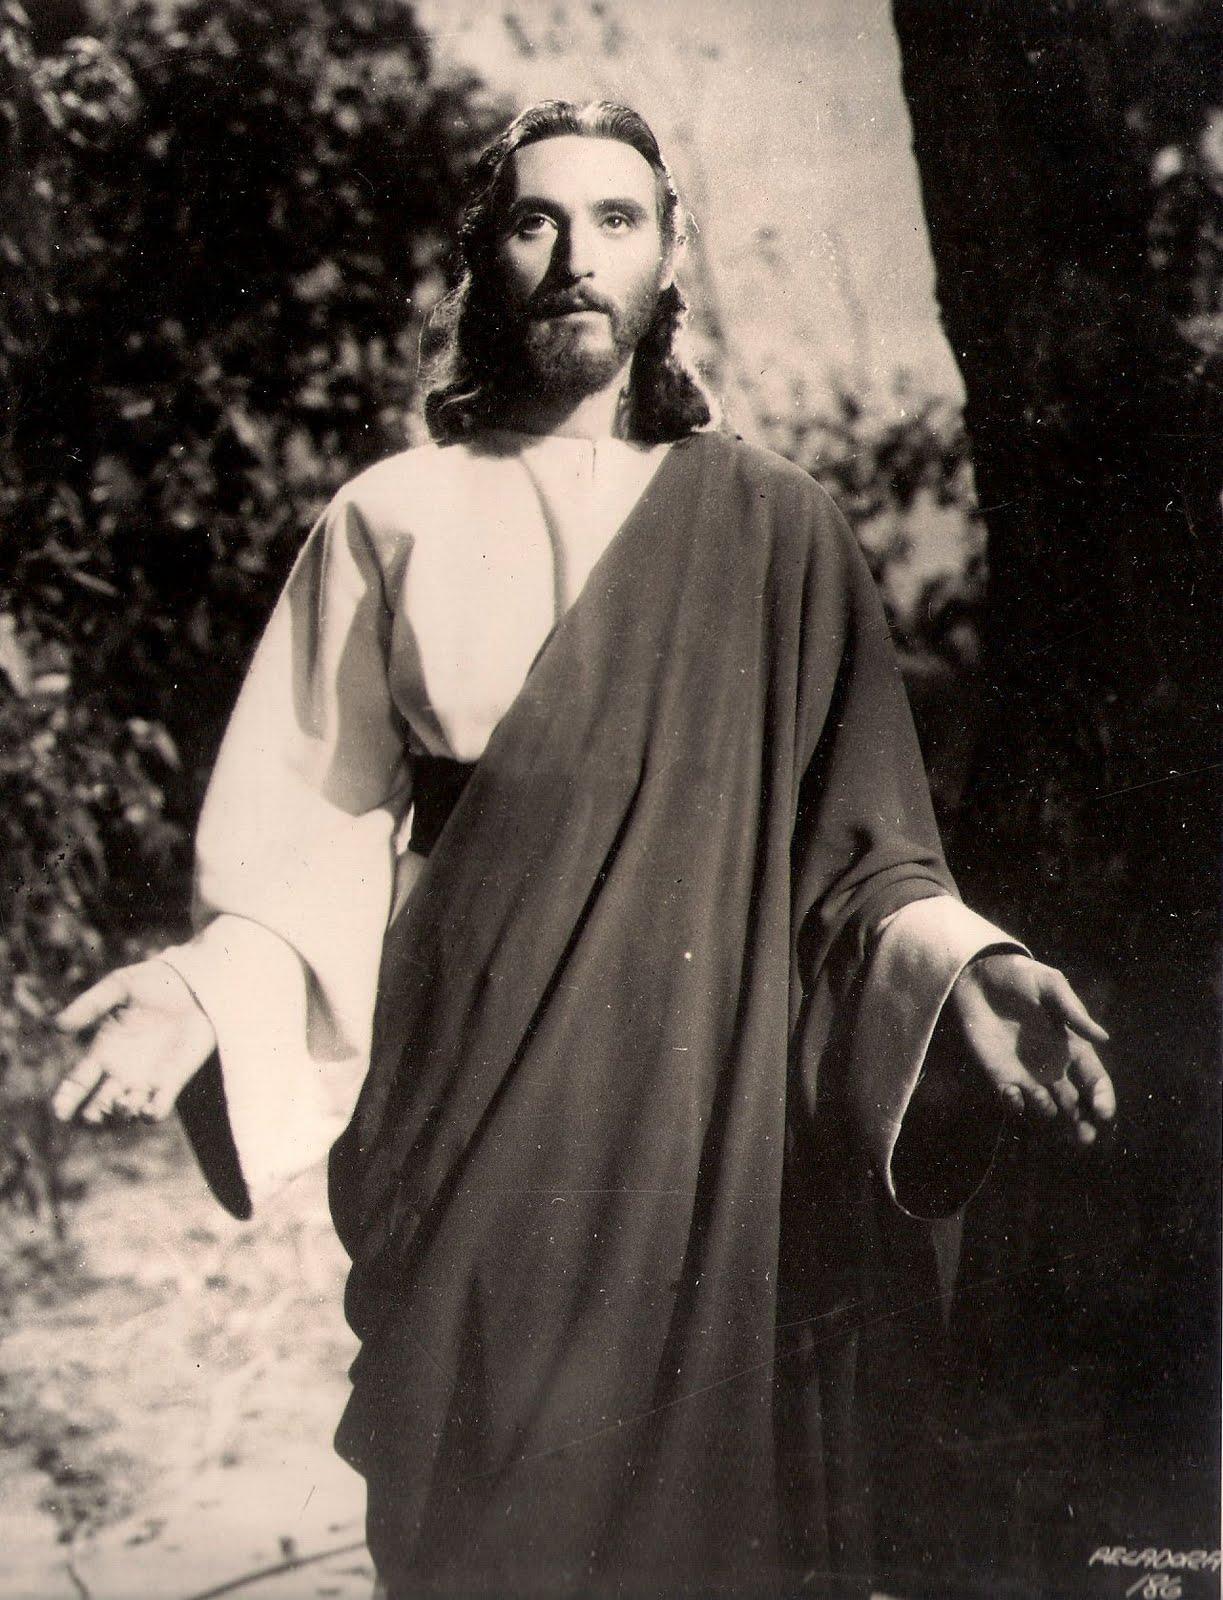 Luis Alcoriza in María Magdalena, pecadora de Magdala (1946)